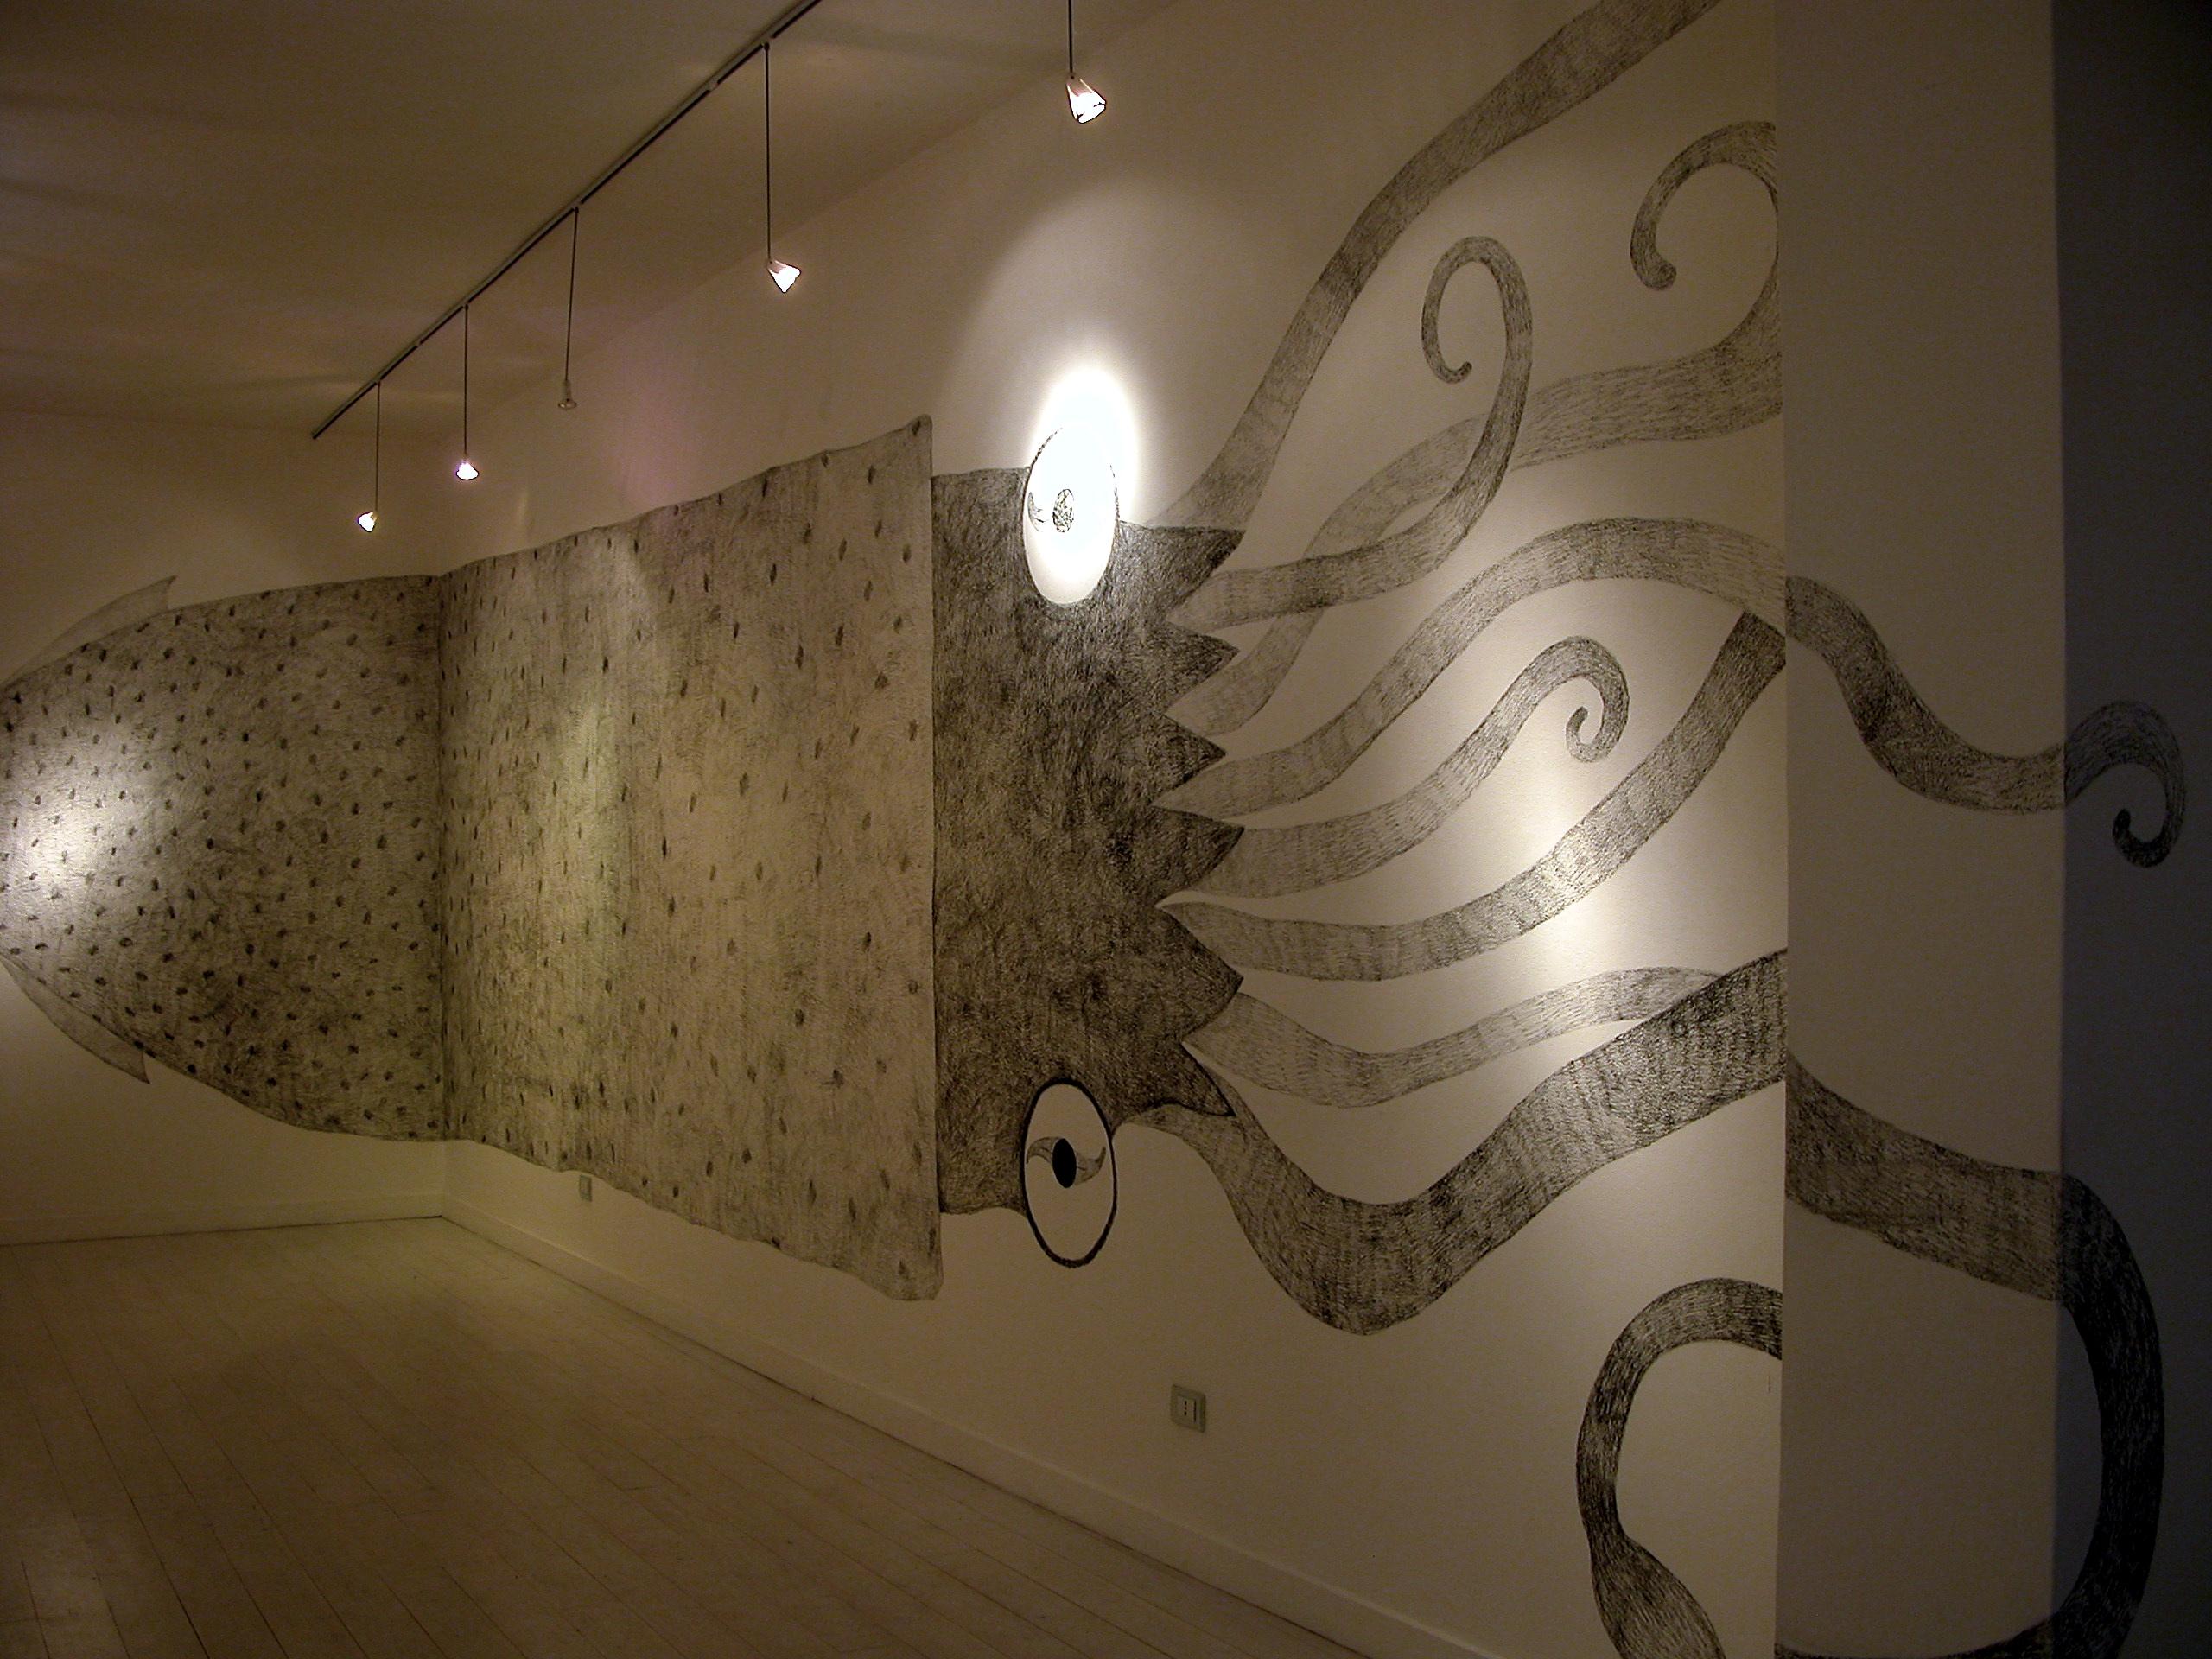 Josephine Sassu - Serie Monumenti Provvisori, 2007